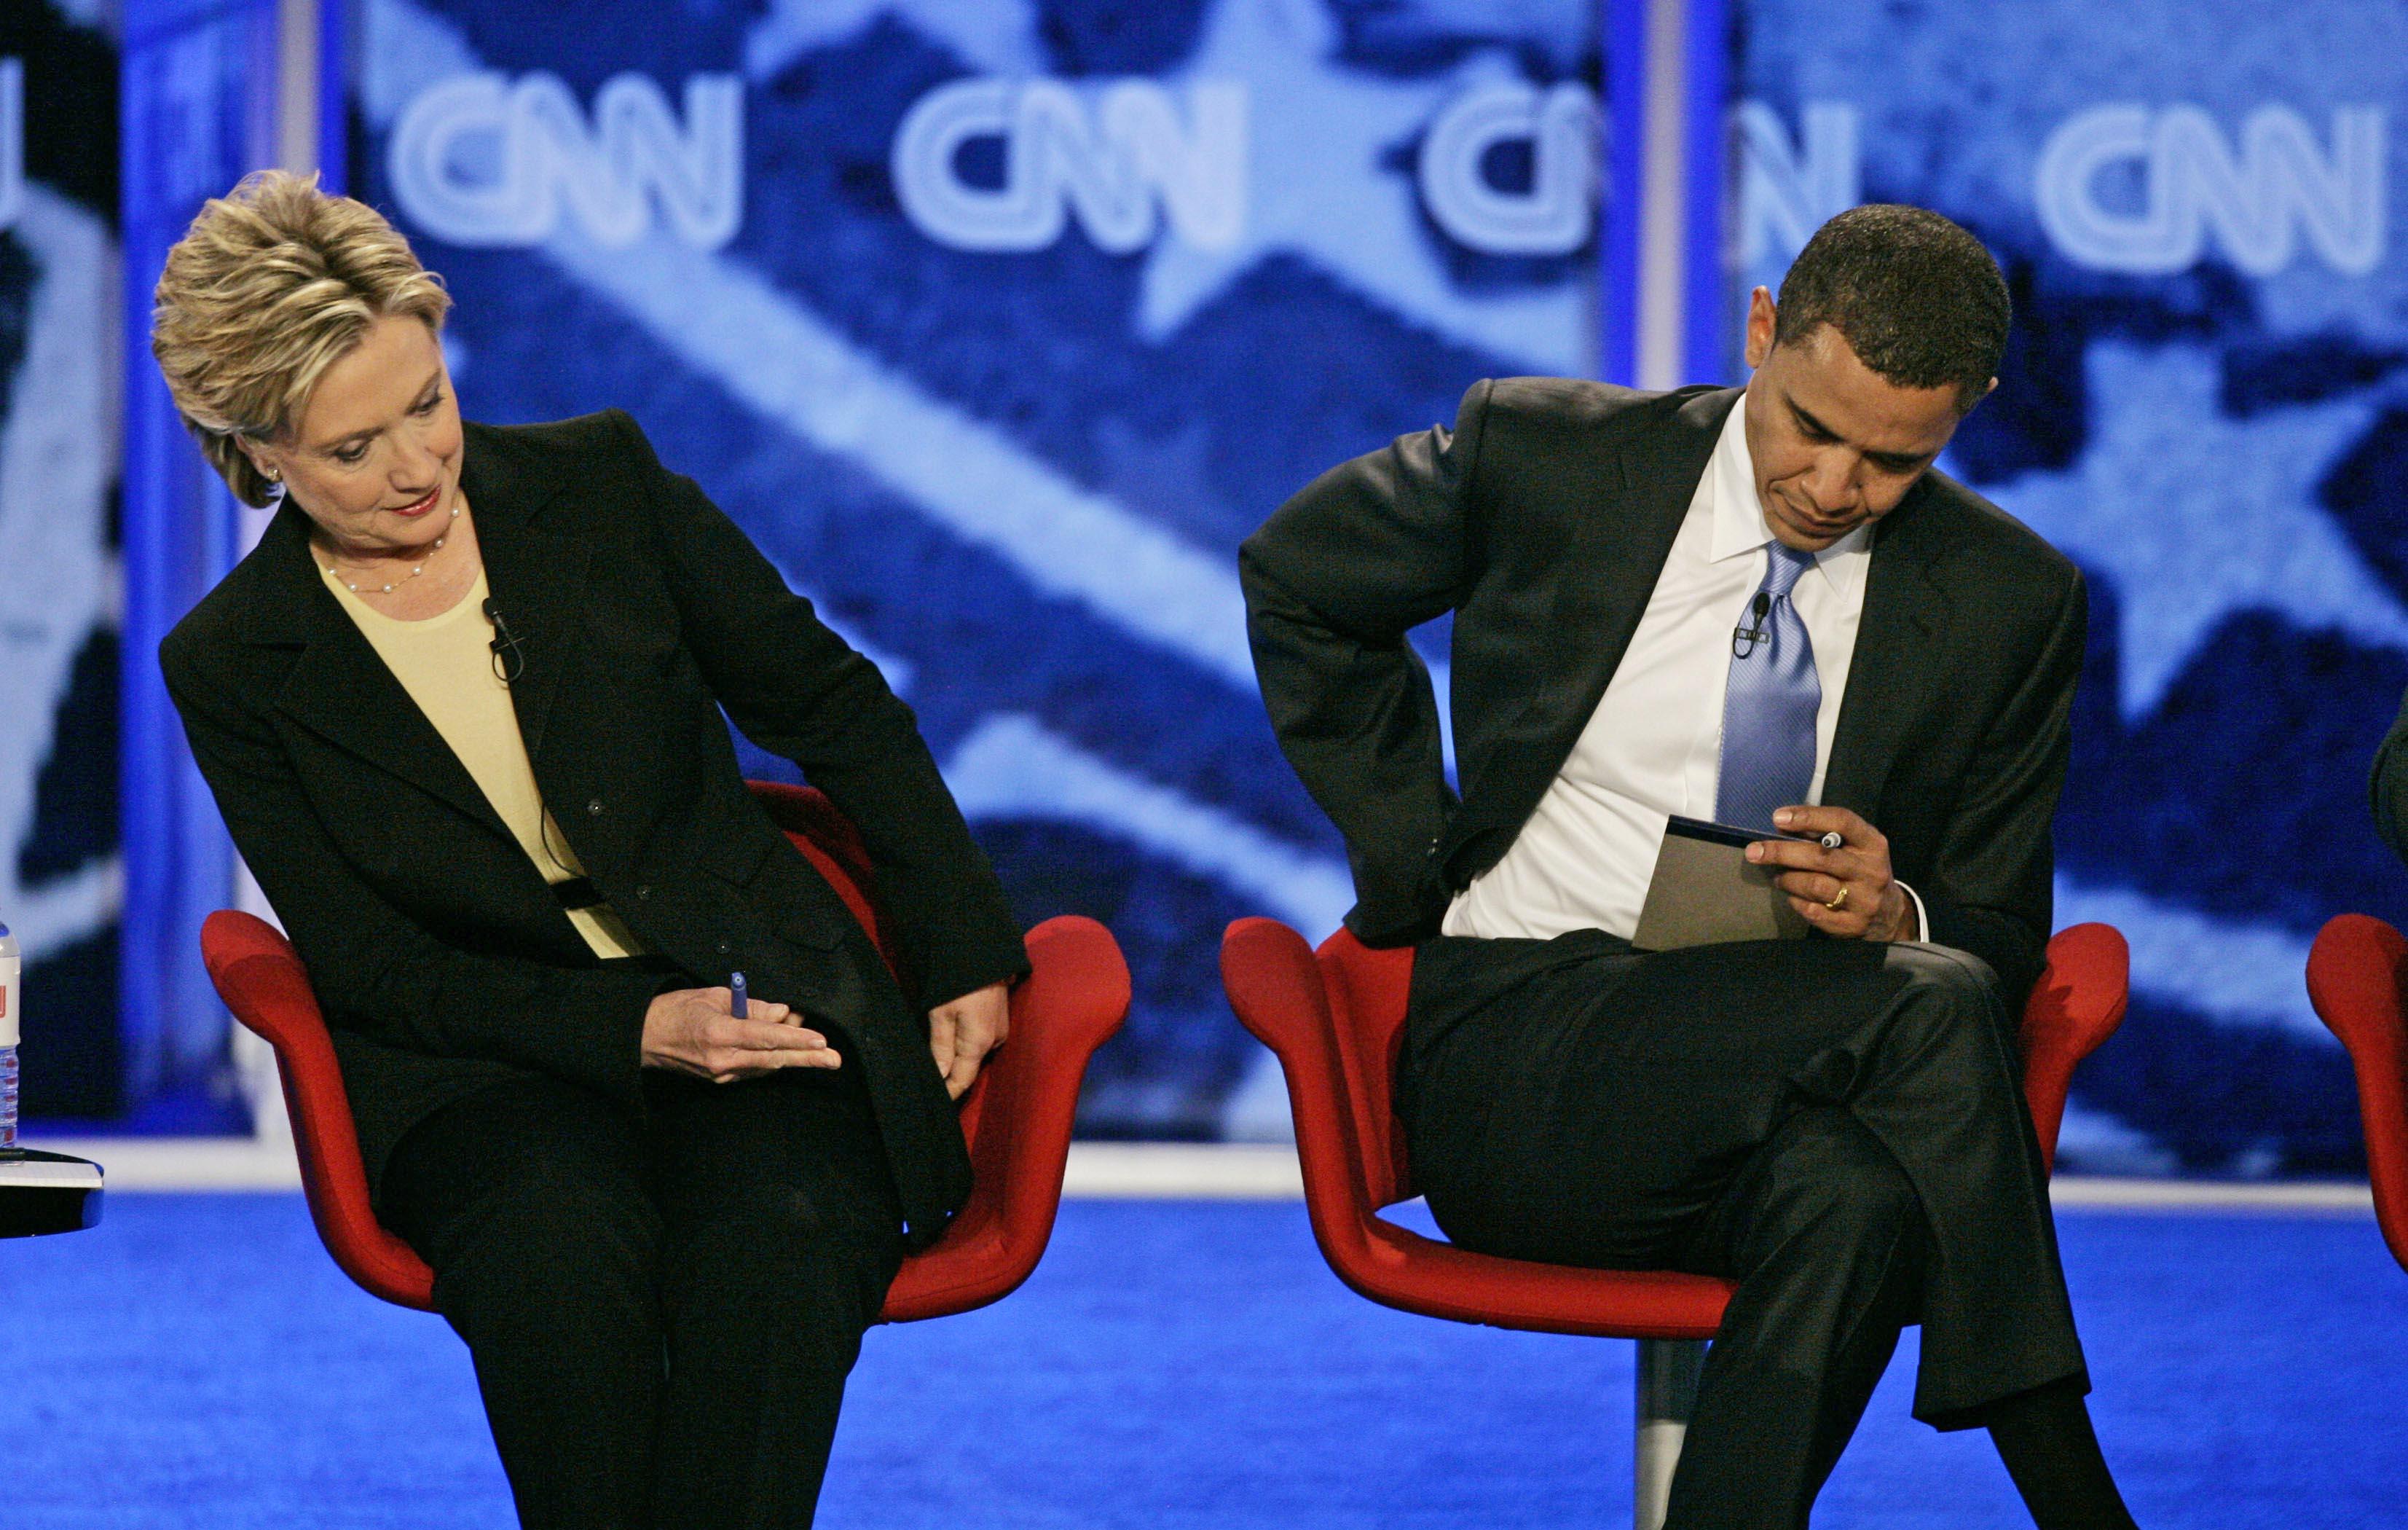 June 2007 Democratic presidential hopefuls Sen. Hillary Clinton, D-N.Y., left, and Sen. Barack Obama, D-Ill. adjust their seats at a Democratic presidential primary debate in Manchester, N.H. on June 3, 2007.